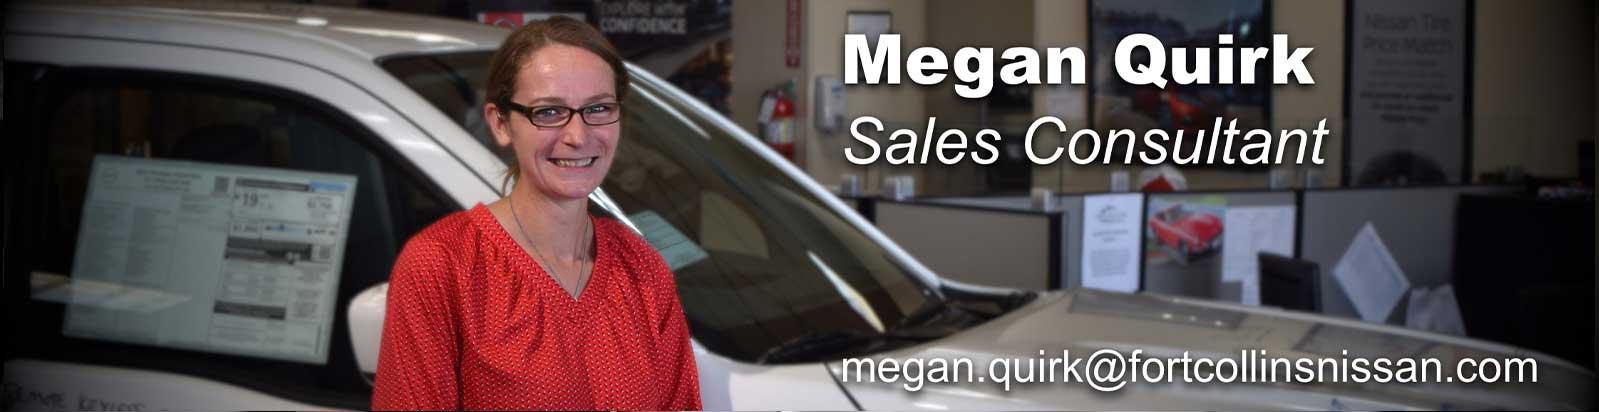 Megan Quirk